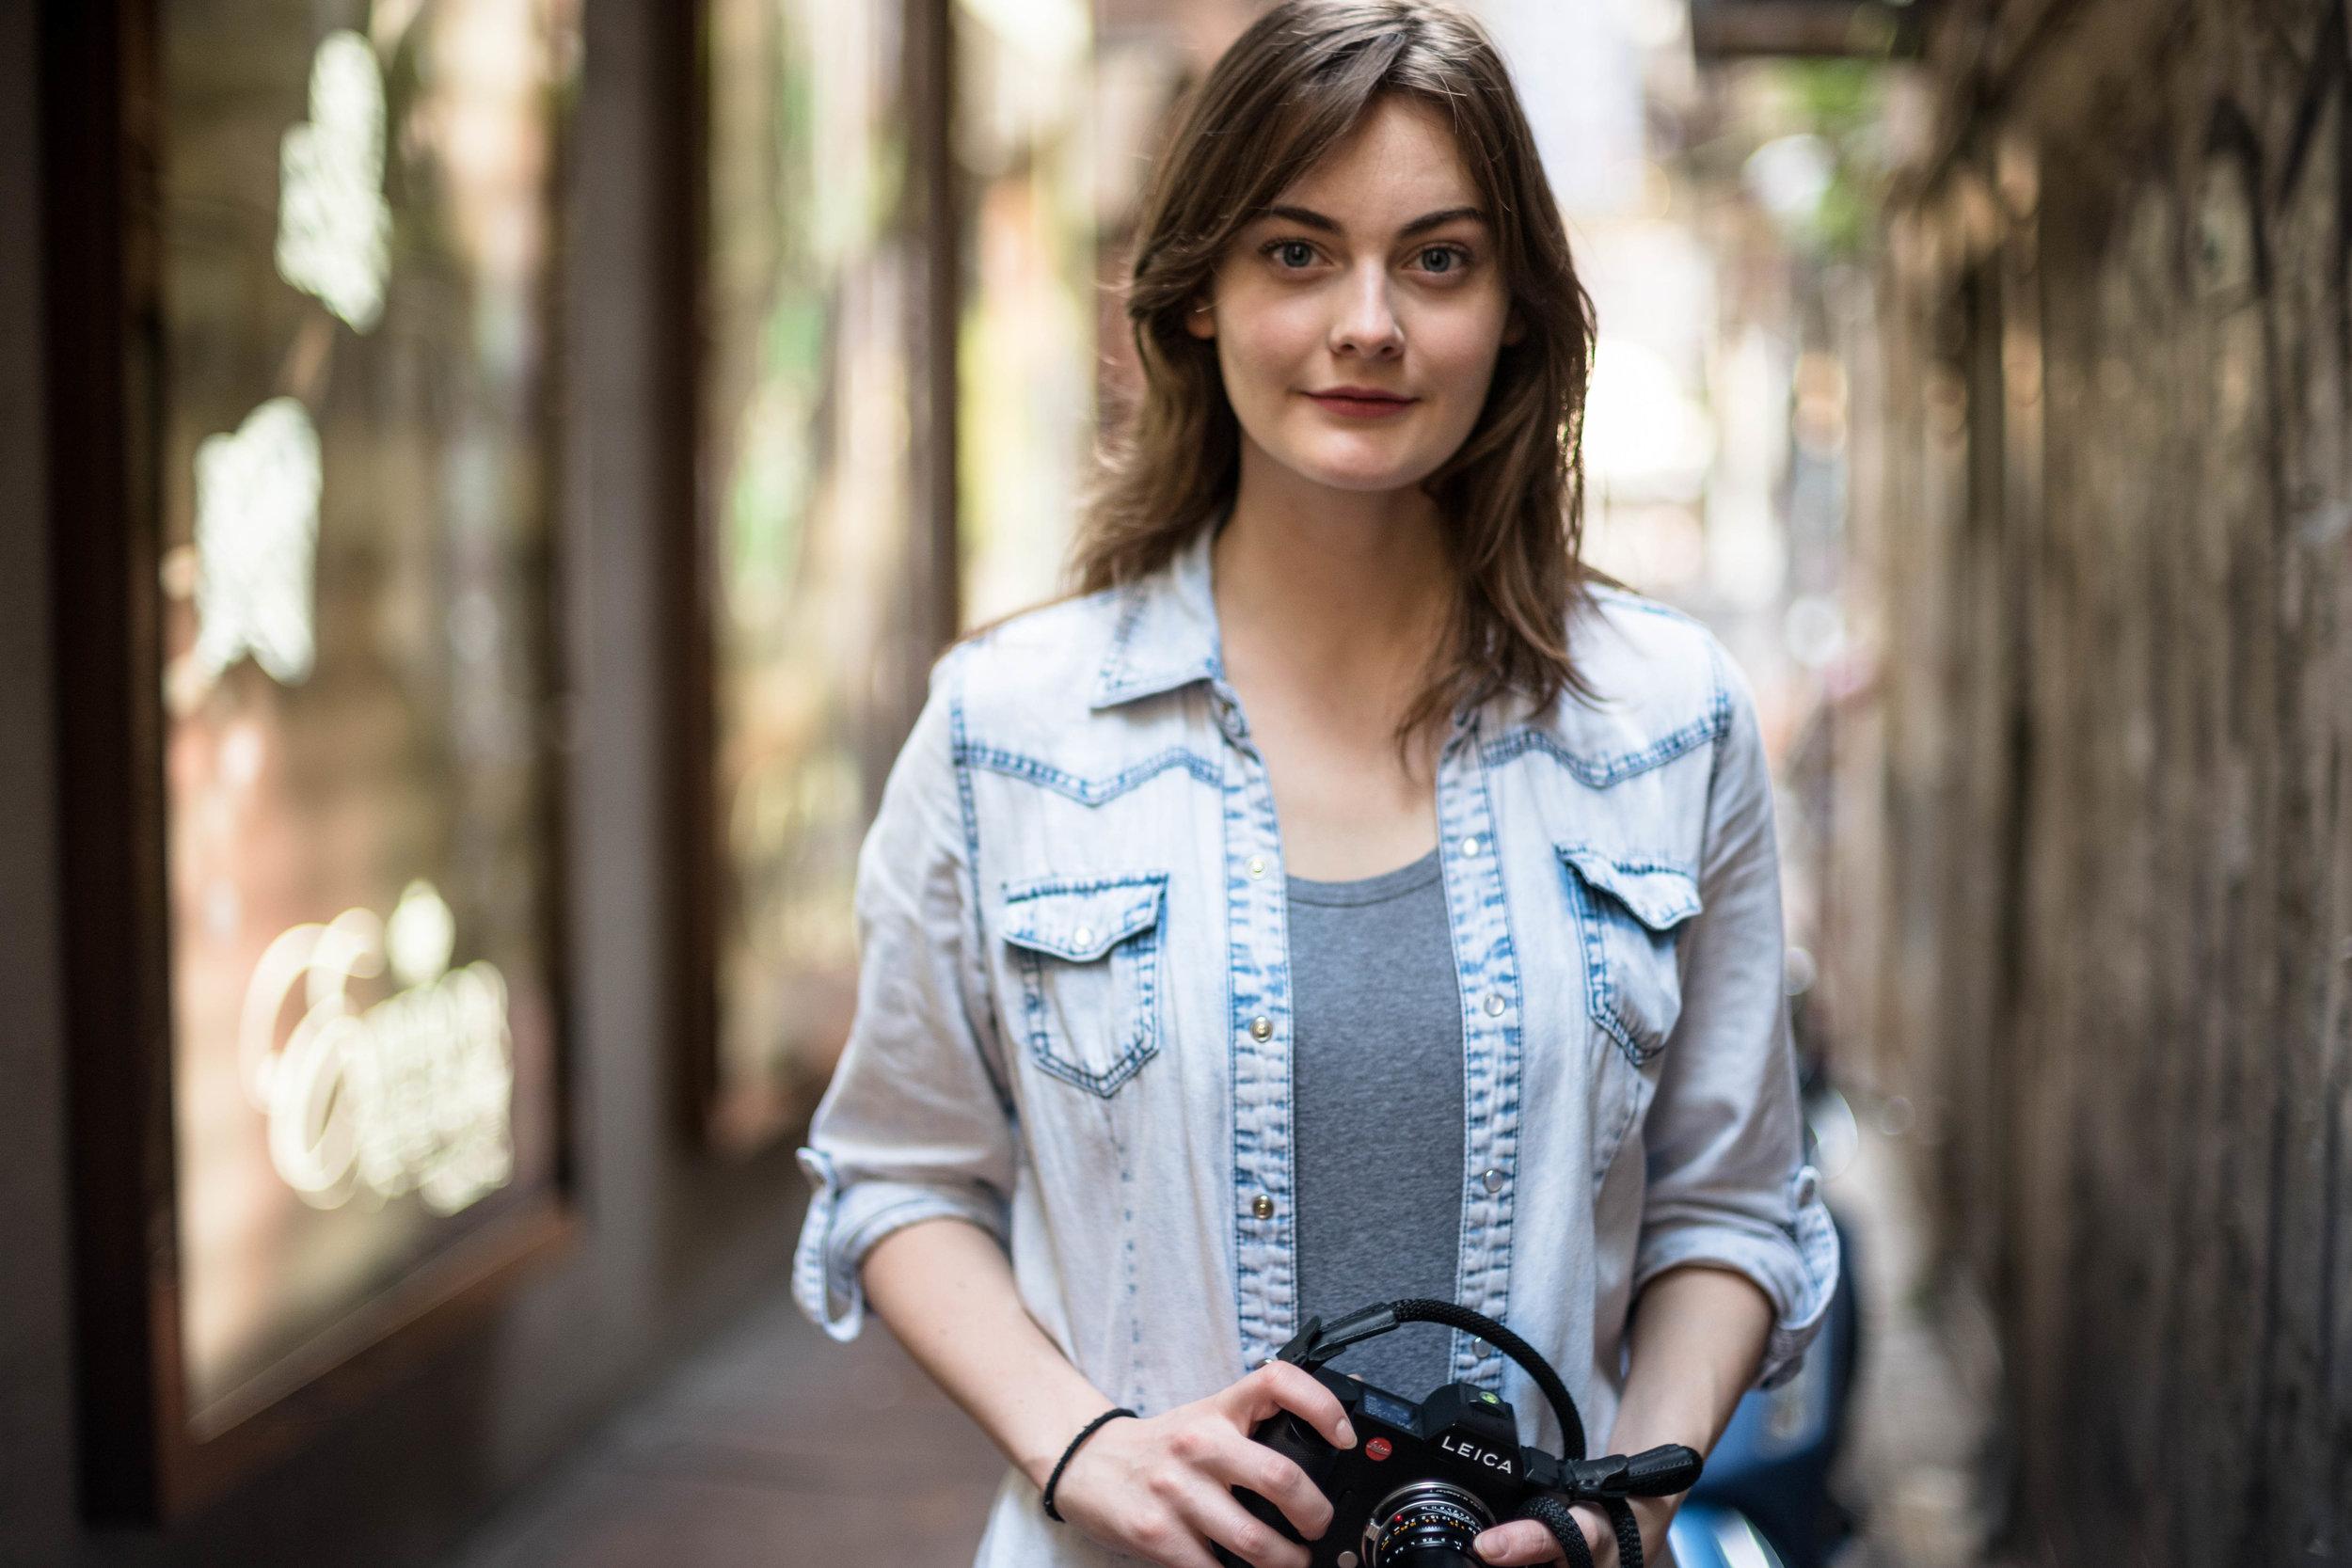 Leica SL + 50 f/1.4 Summilux-R, shot at ISO 320, f/1.4, 1/200s.